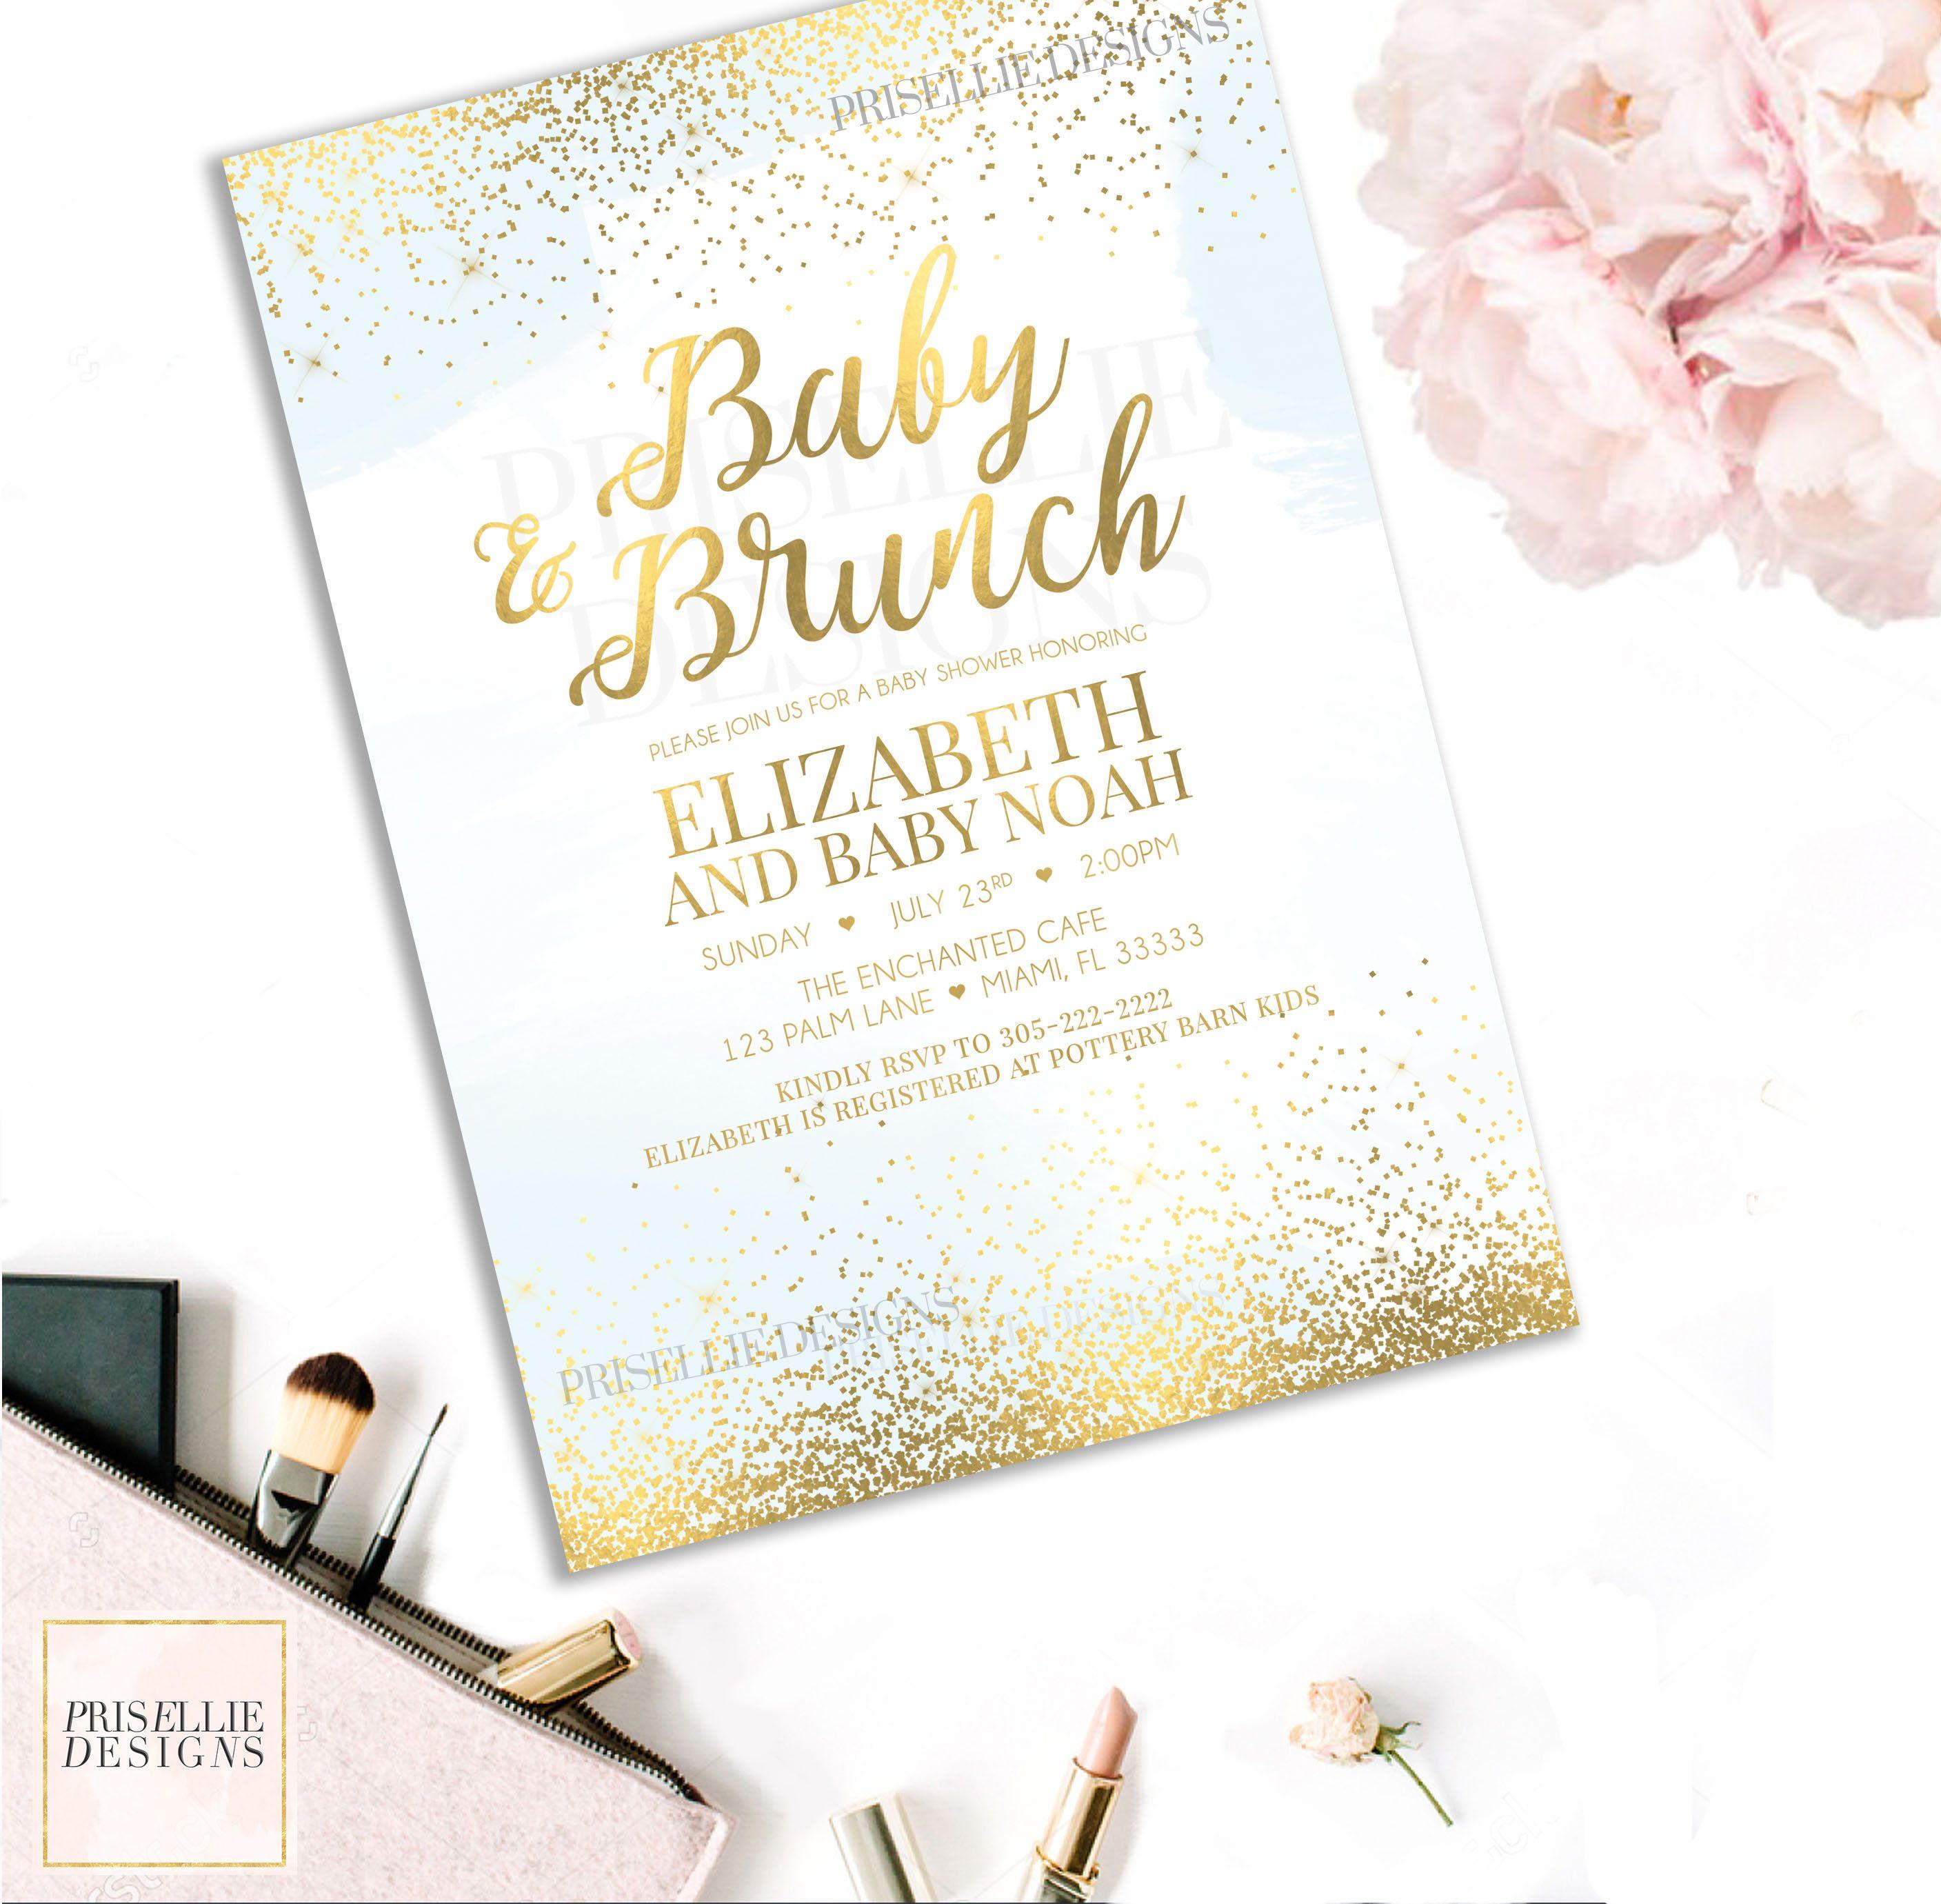 Boy Baby Shower Invitation, Baby & Brunch Baby Shower Invitation ...